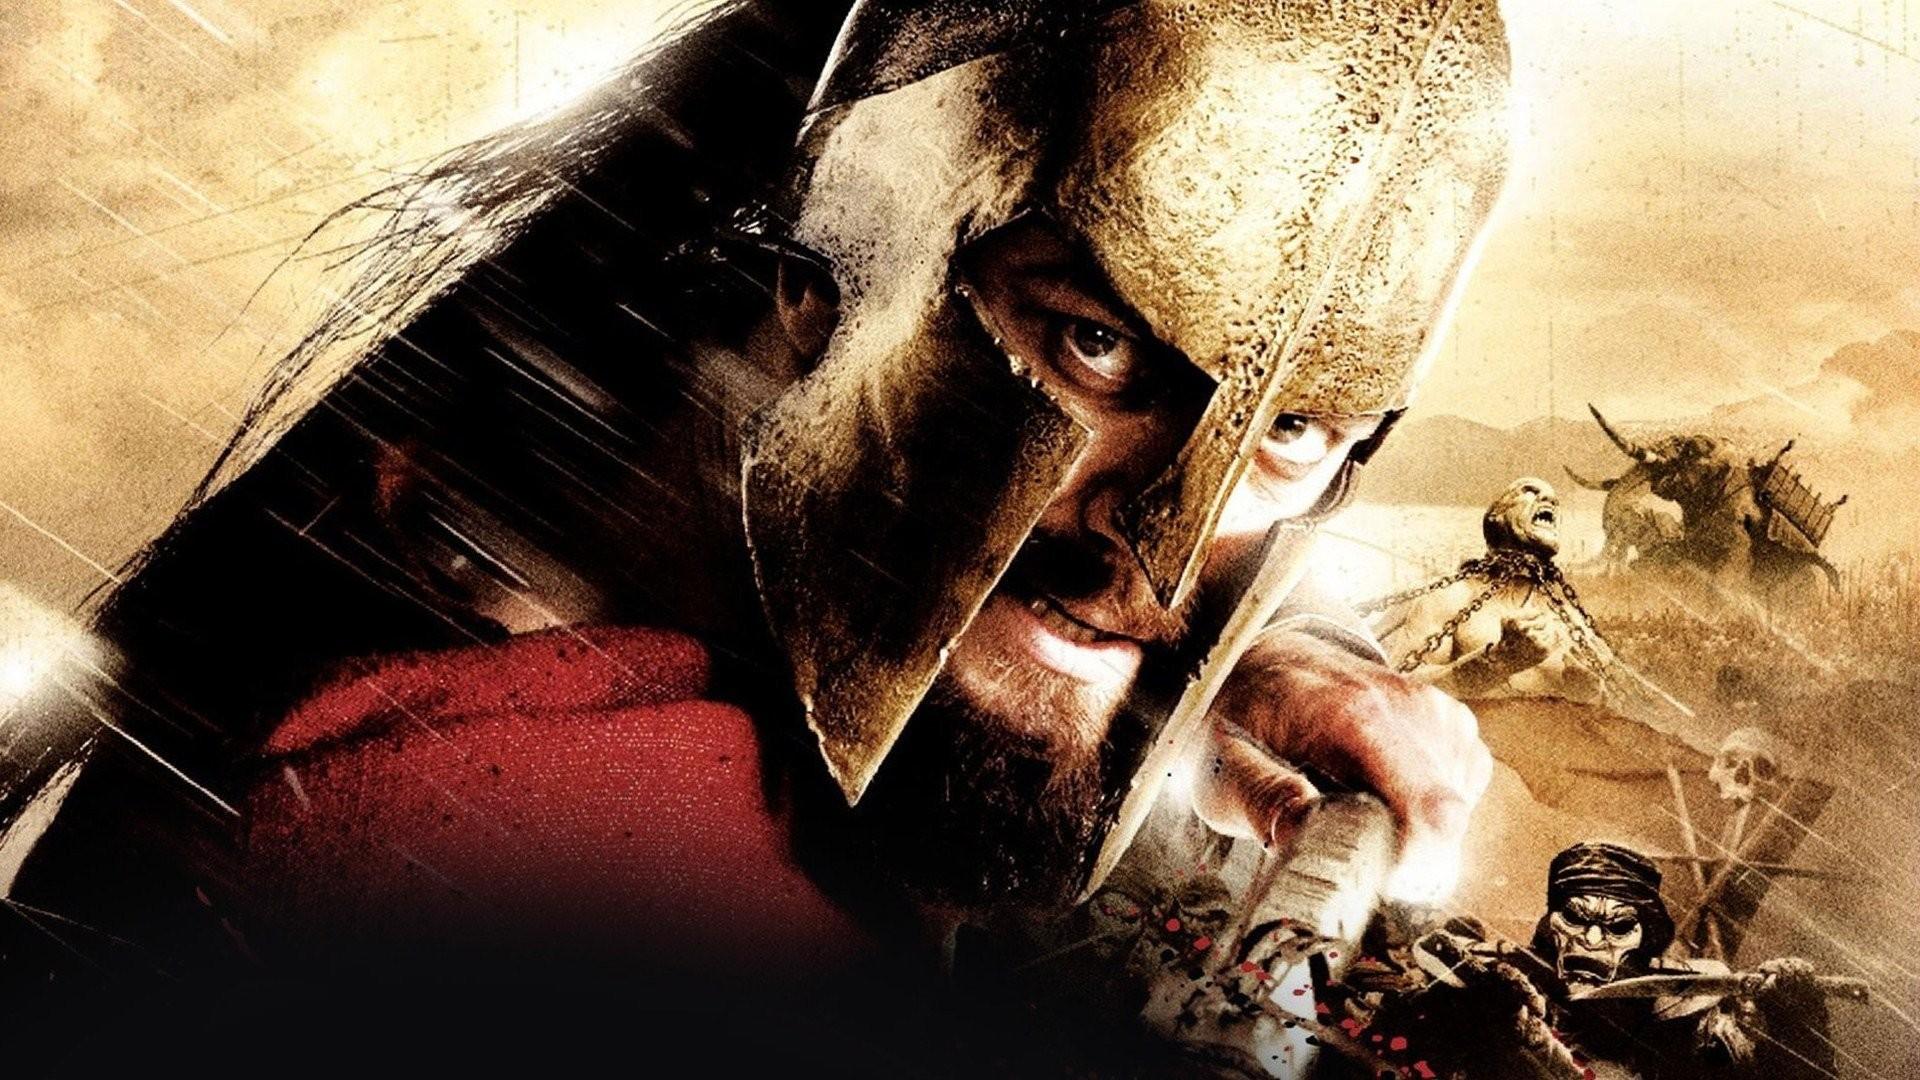 Spartans 300 Wallpaper (58+ images)